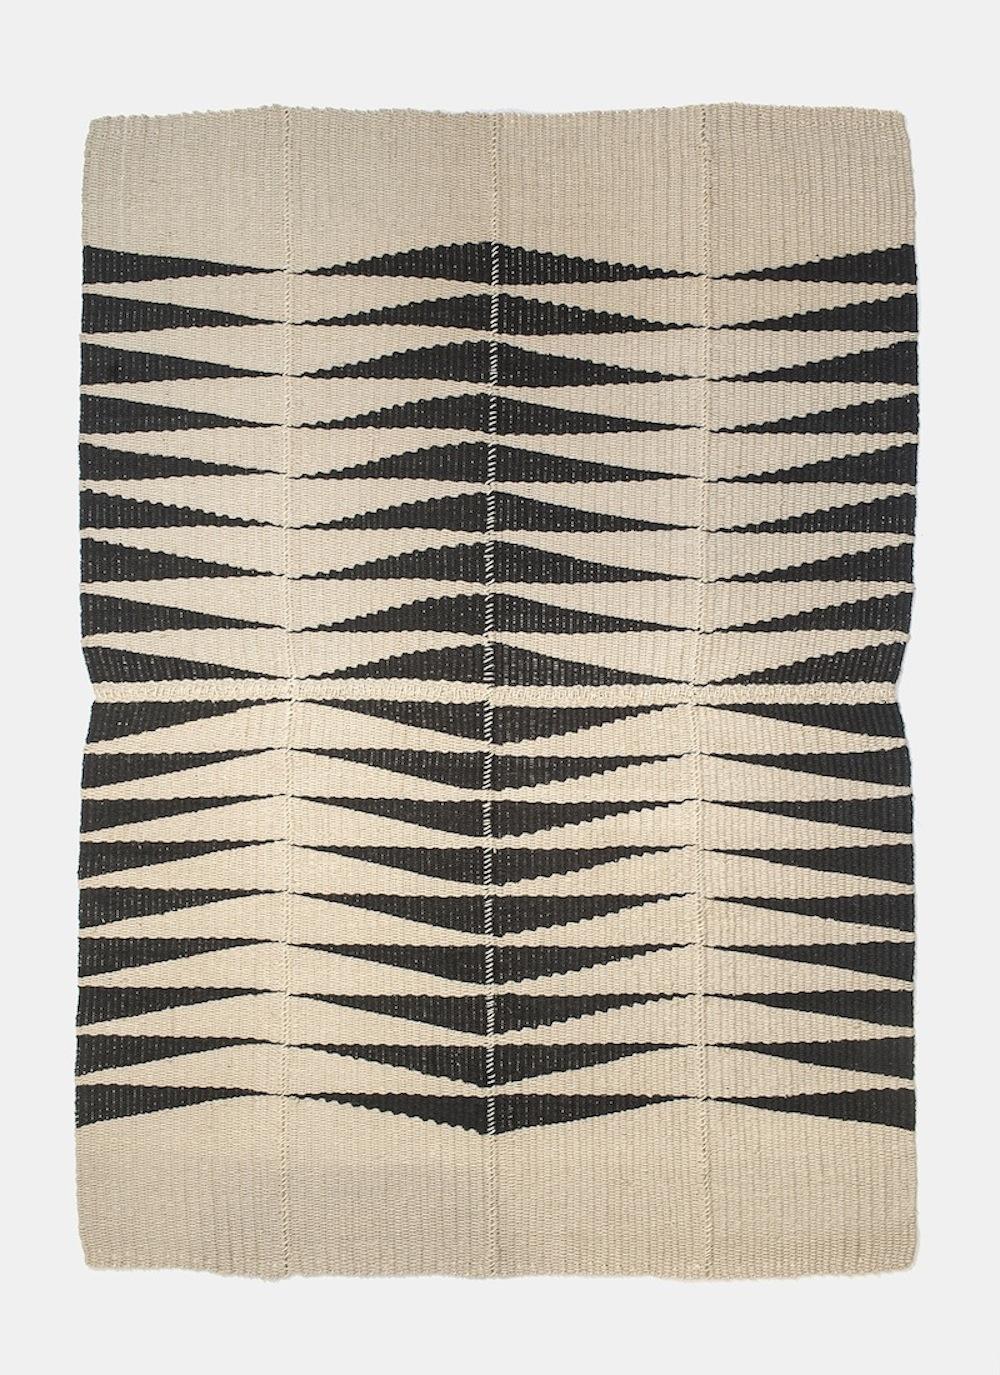 "84"" x 60"" / 100% hemp rug / 2017 / SOLD"